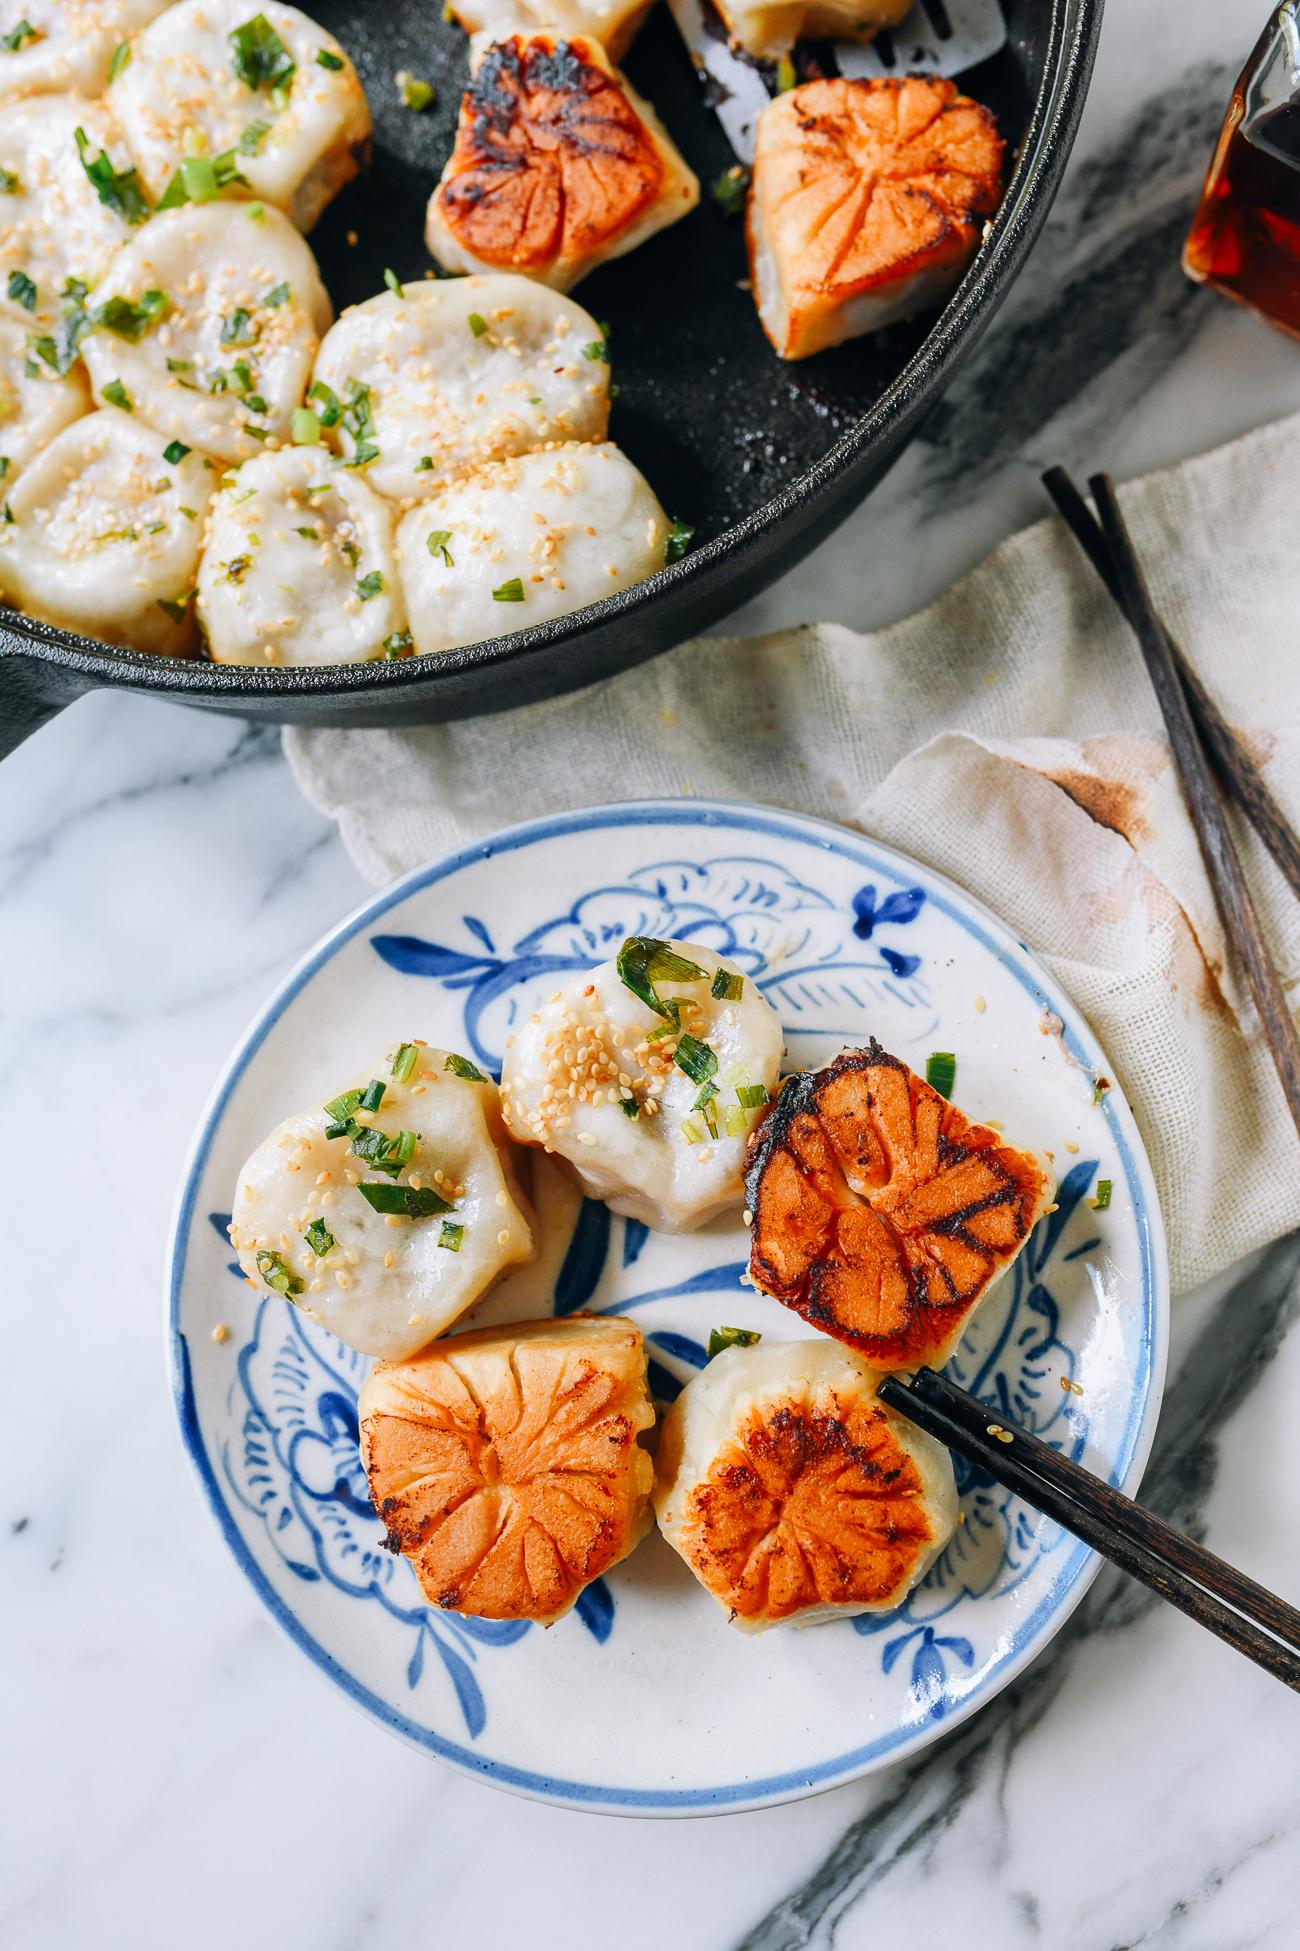 Shanghai Pan-fried Pork Buns, Shengjian Mantou, thewoksoflife.com